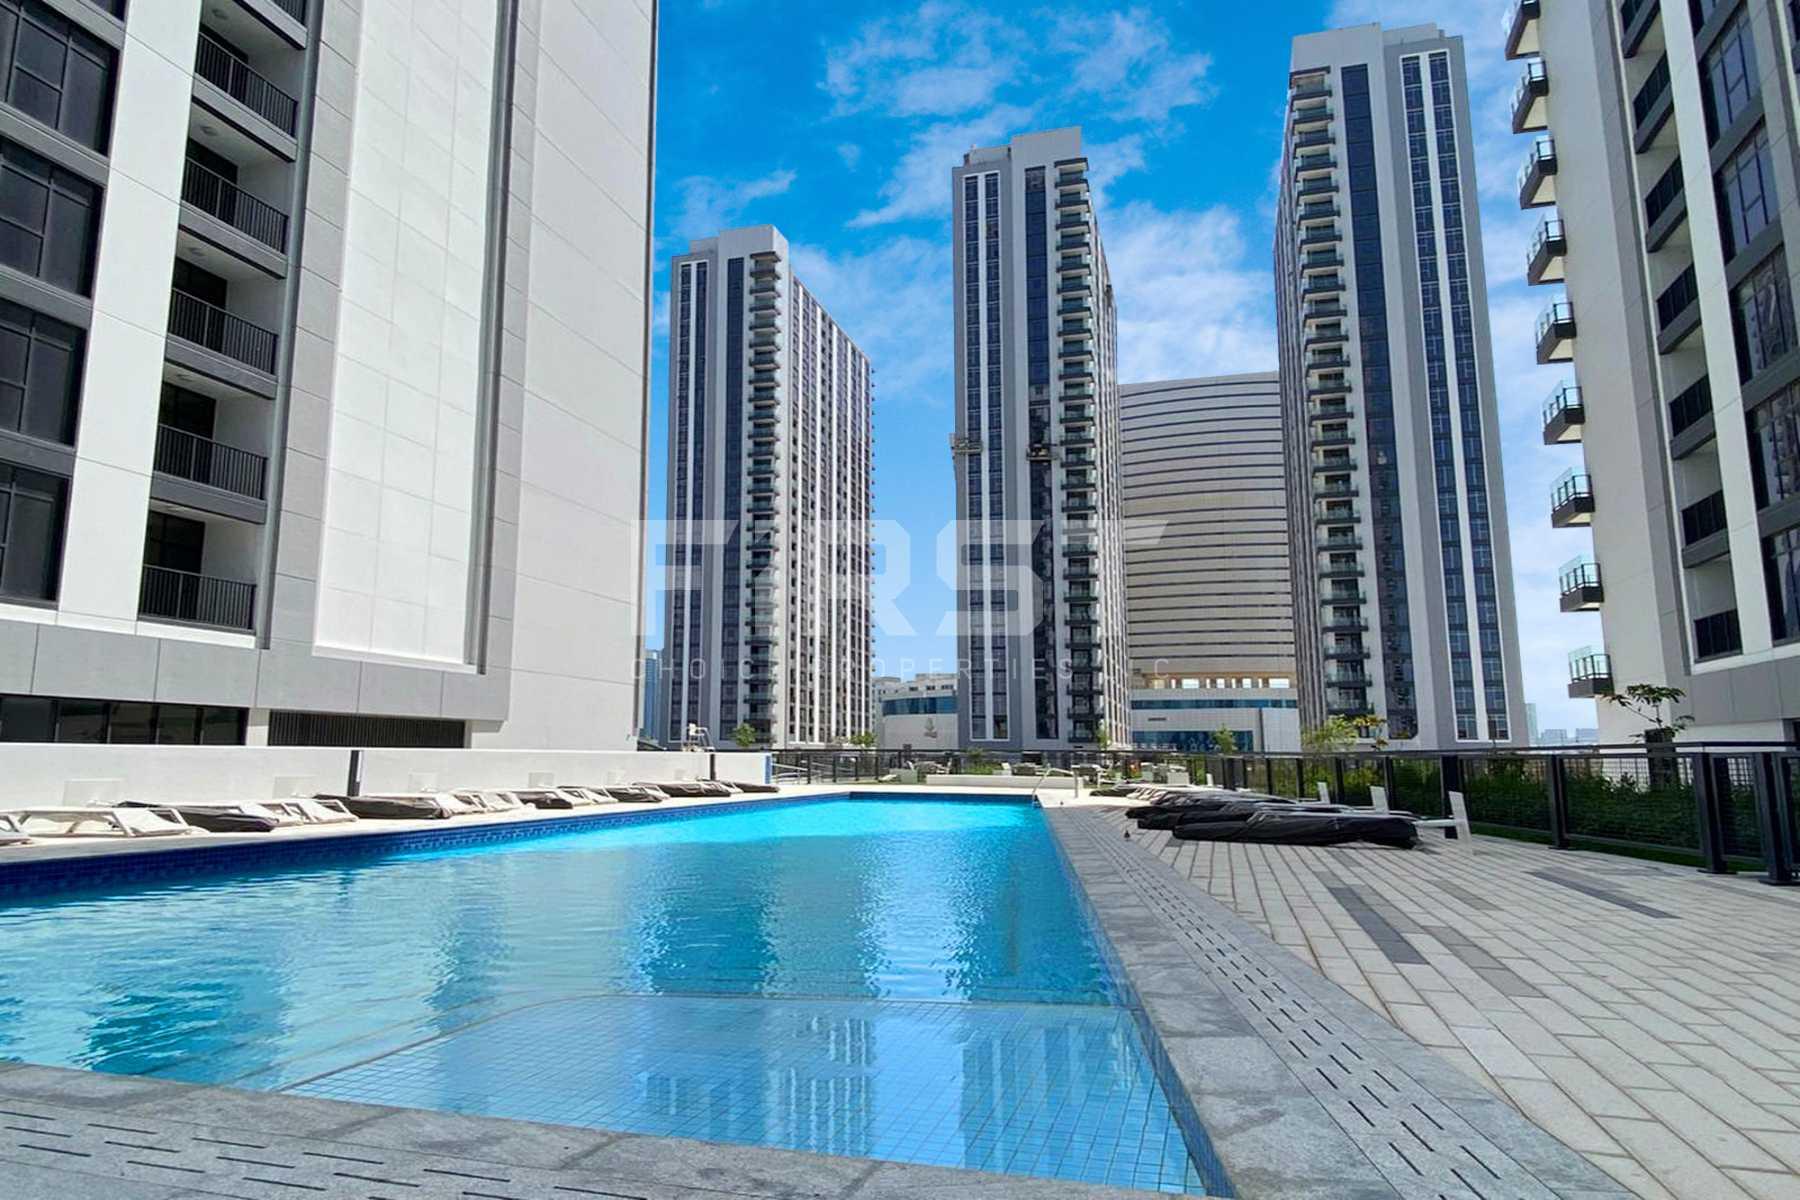 External Photo of The Bridges Shams Abu Dhabi UAE (2).jpg